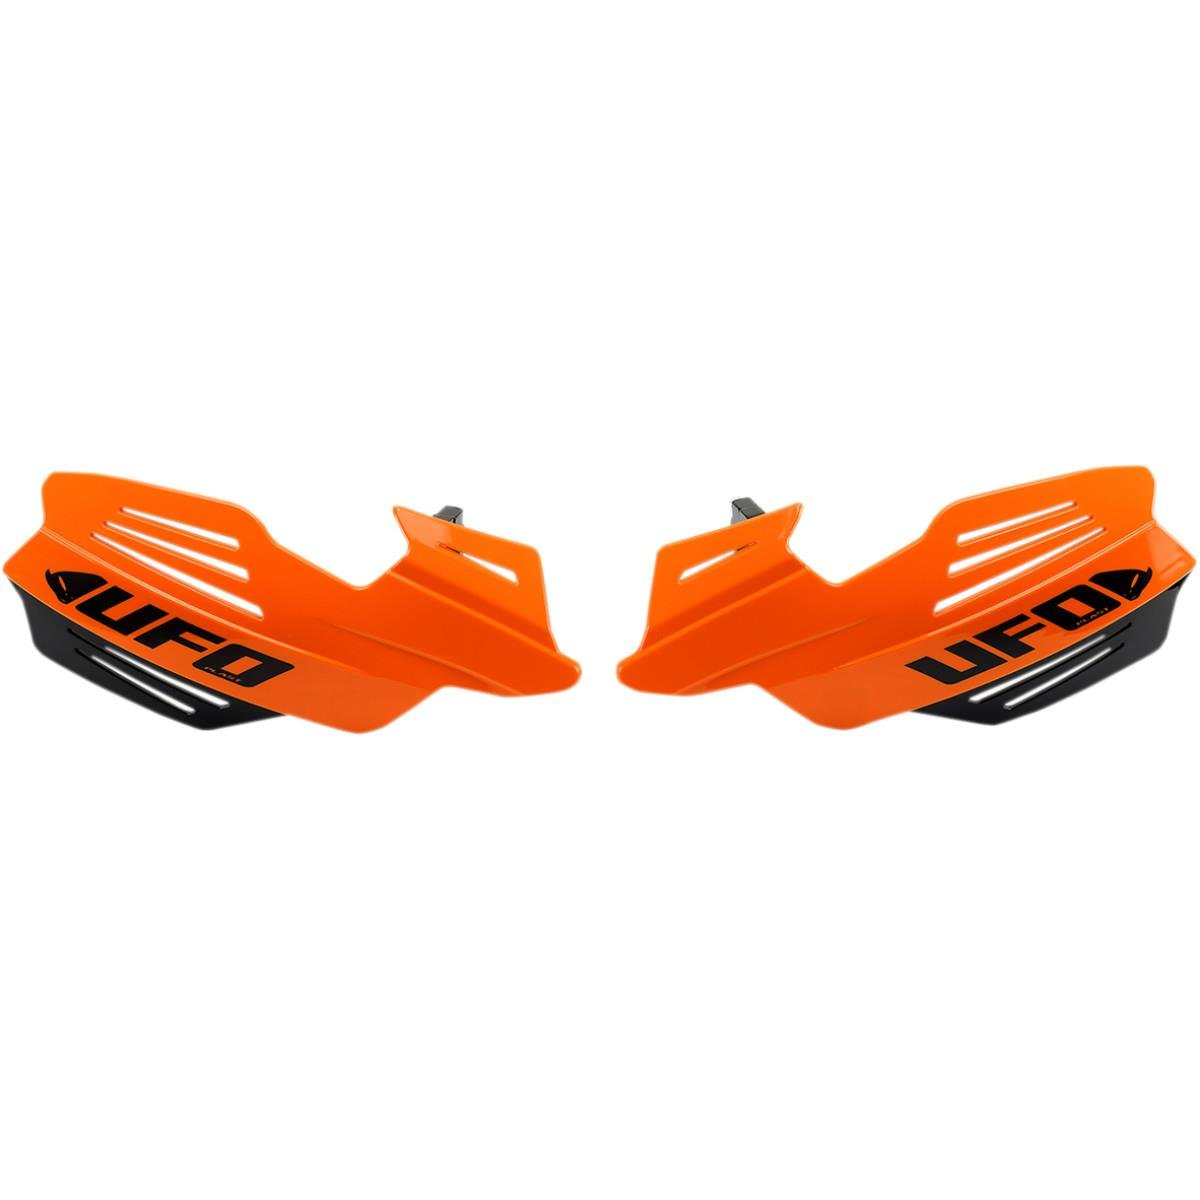 UFO Plastics Vulcan Handguards Orange PM01650127